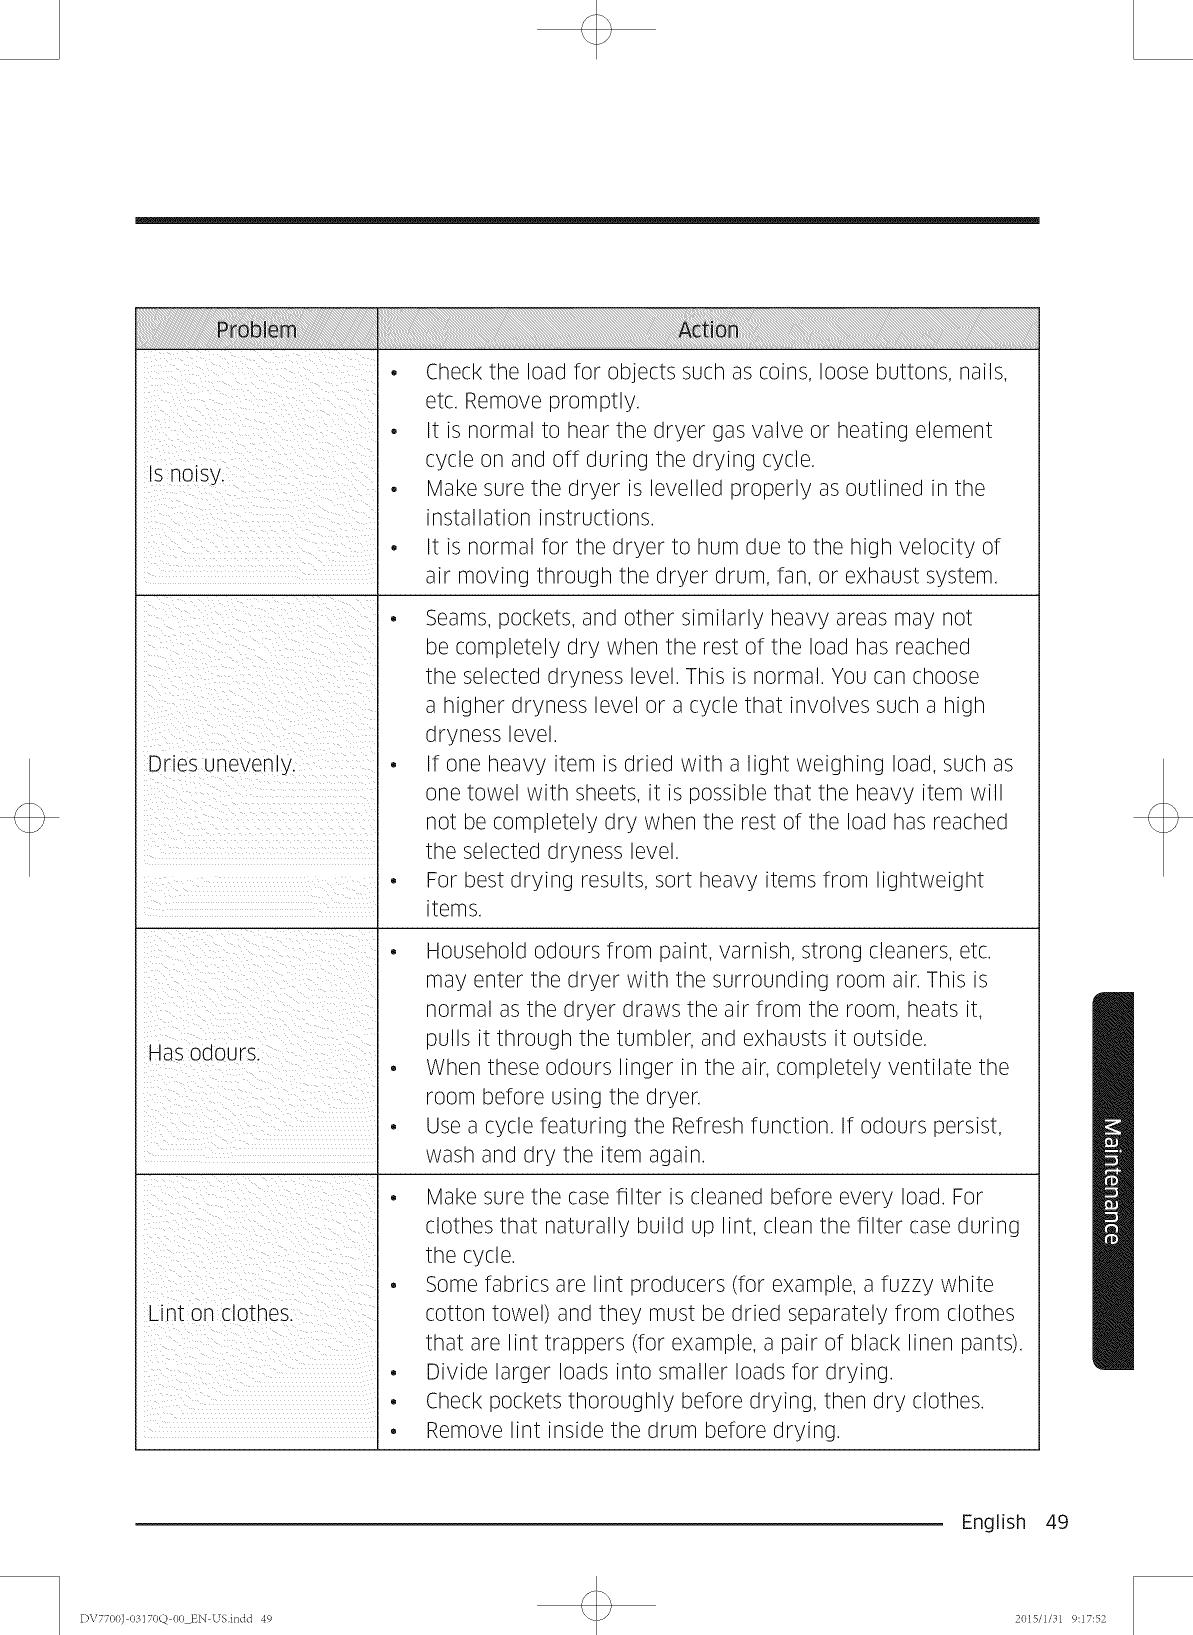 Samsung DV48J7700EW/A2 0000 User Manual DRYER Manuals And